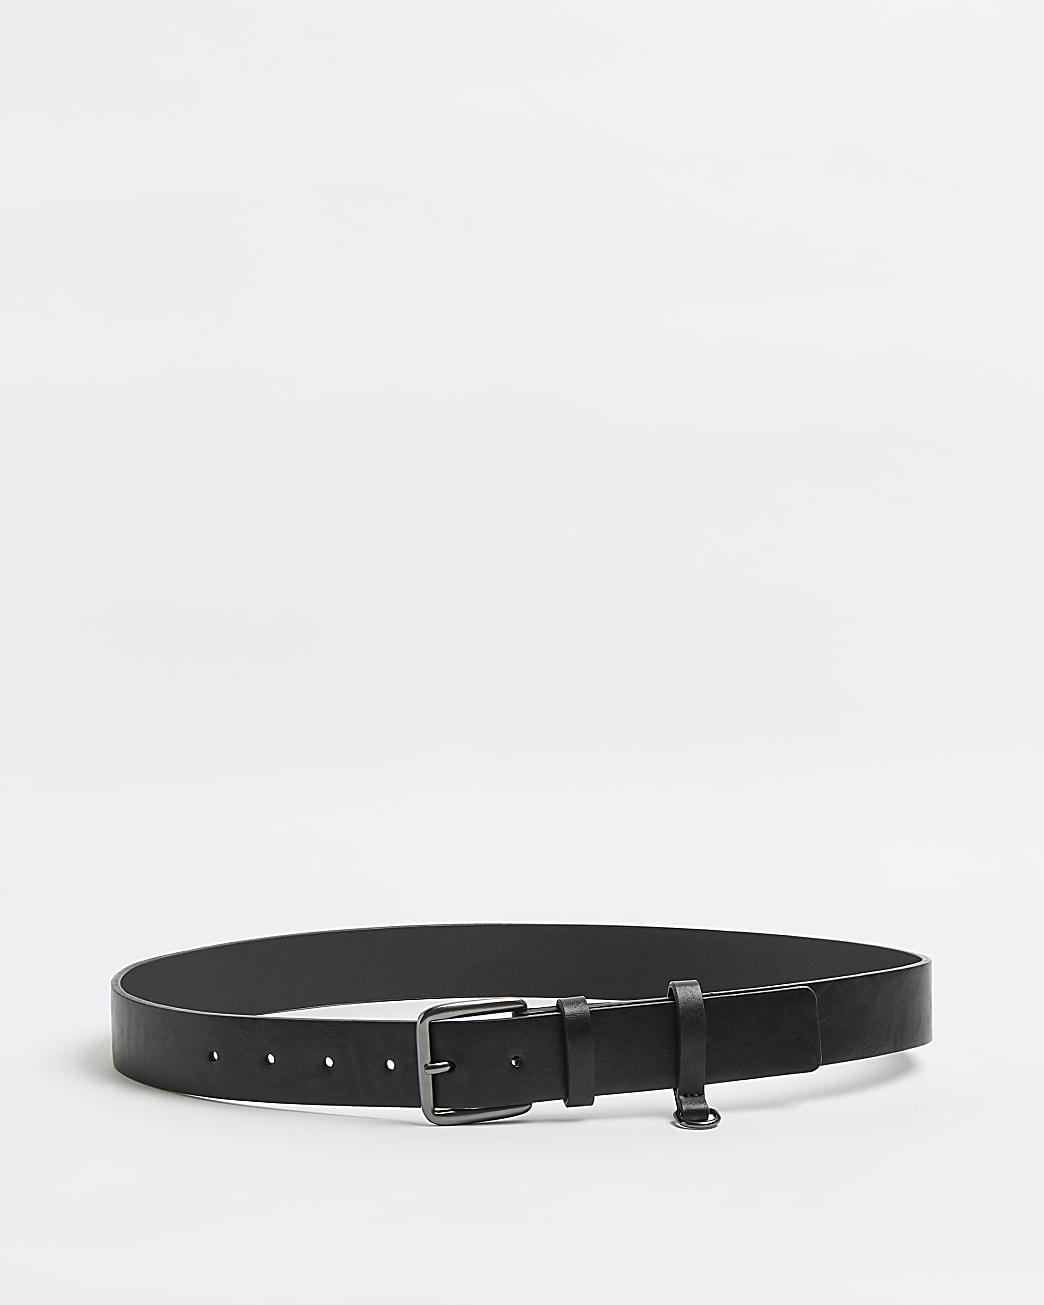 Black PU d ring belt